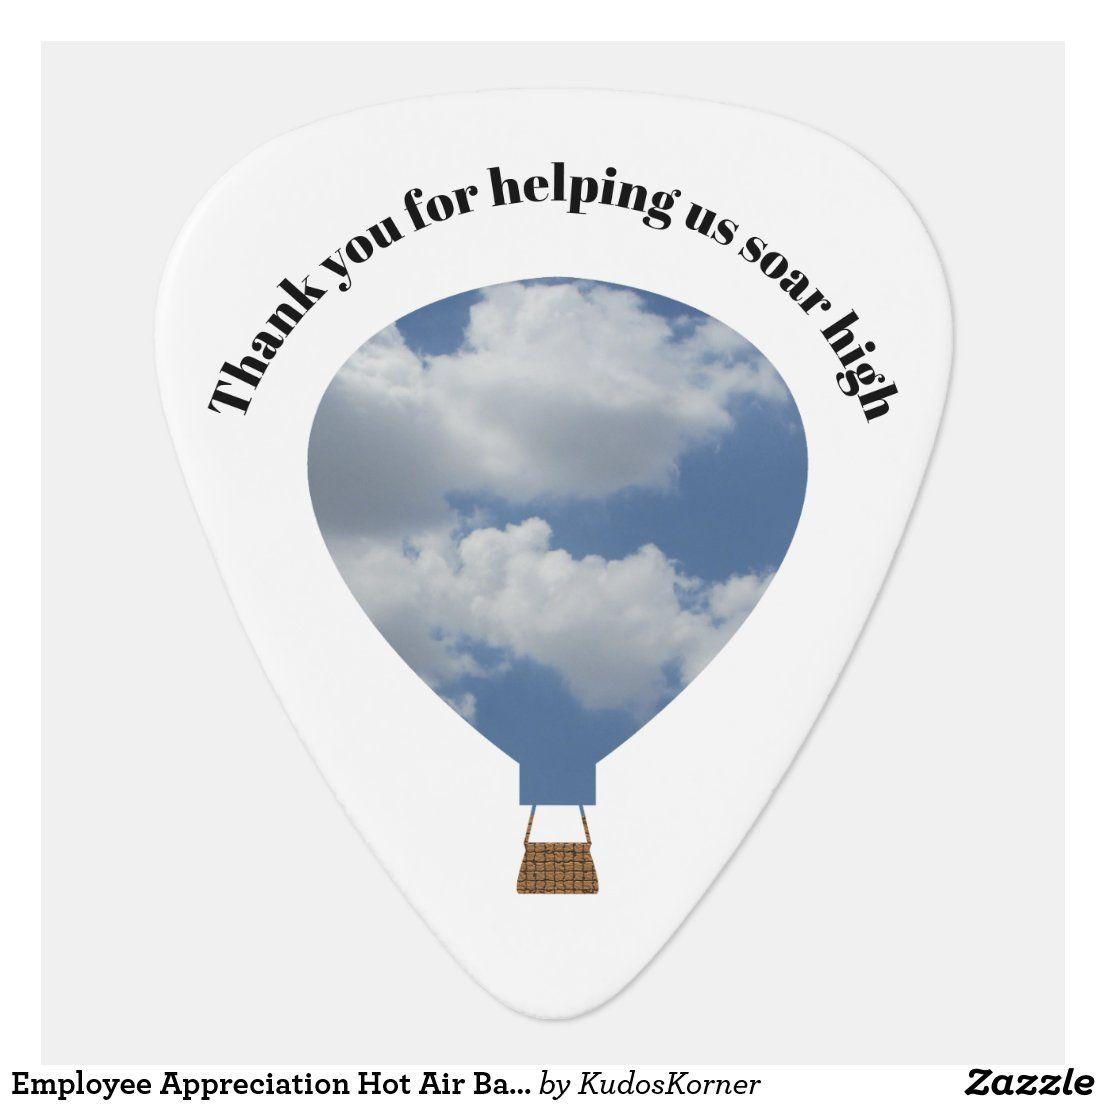 Employee Appreciation Hot Air Balloon Thank You Guitar Pick | Zazzle.com